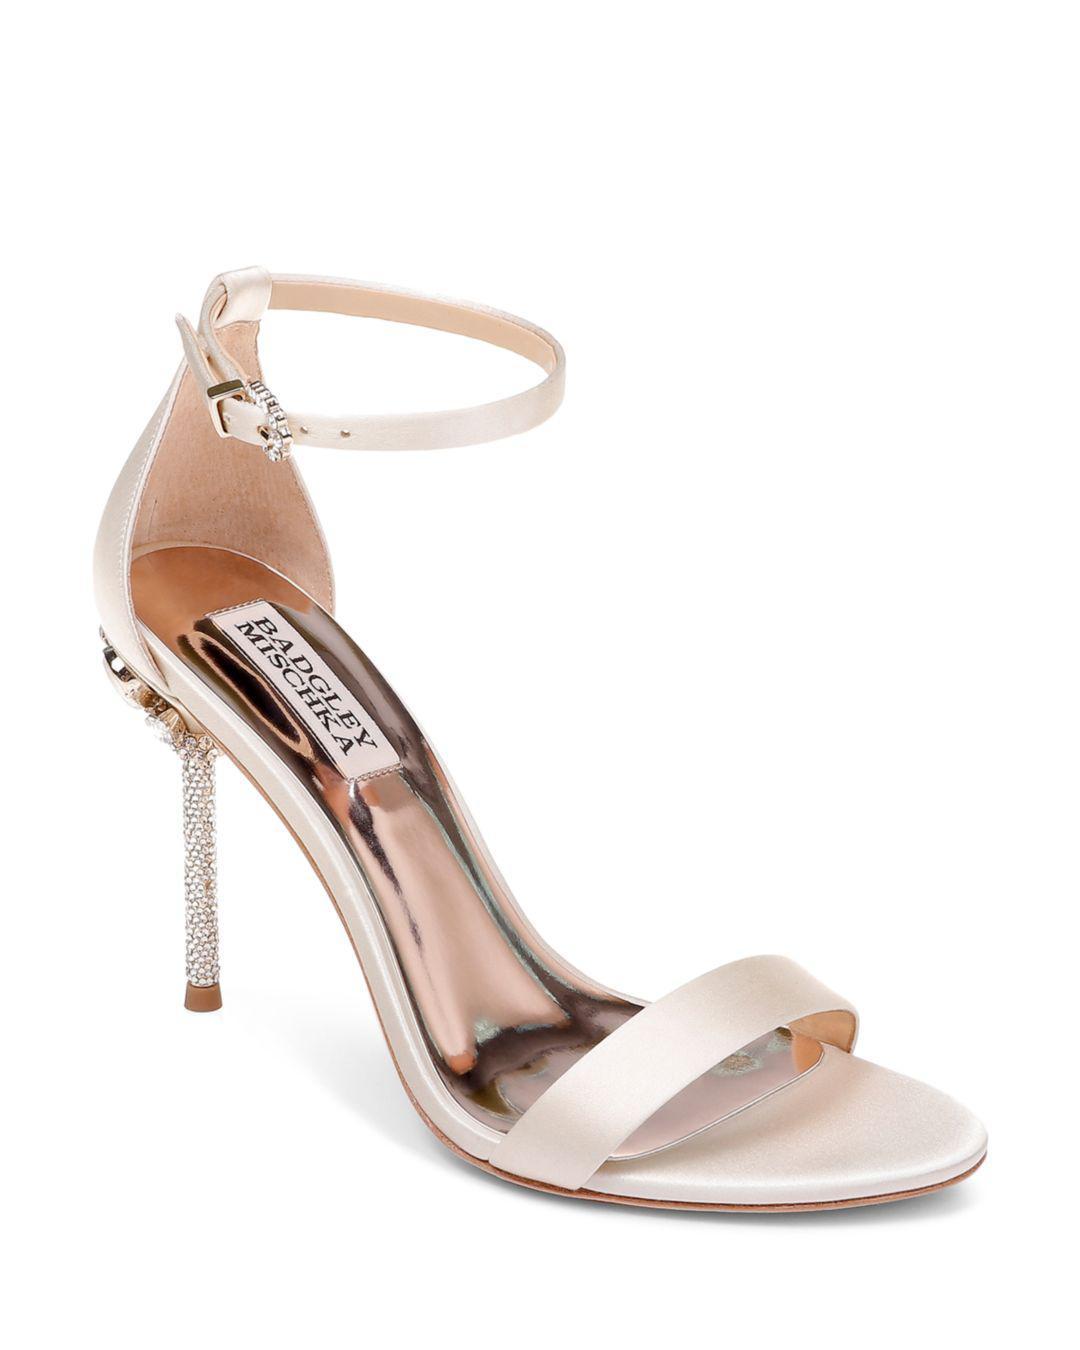 d32e853754f Badgley Mischka. White Women s Vicia Embellished Satin High-heel Sandals